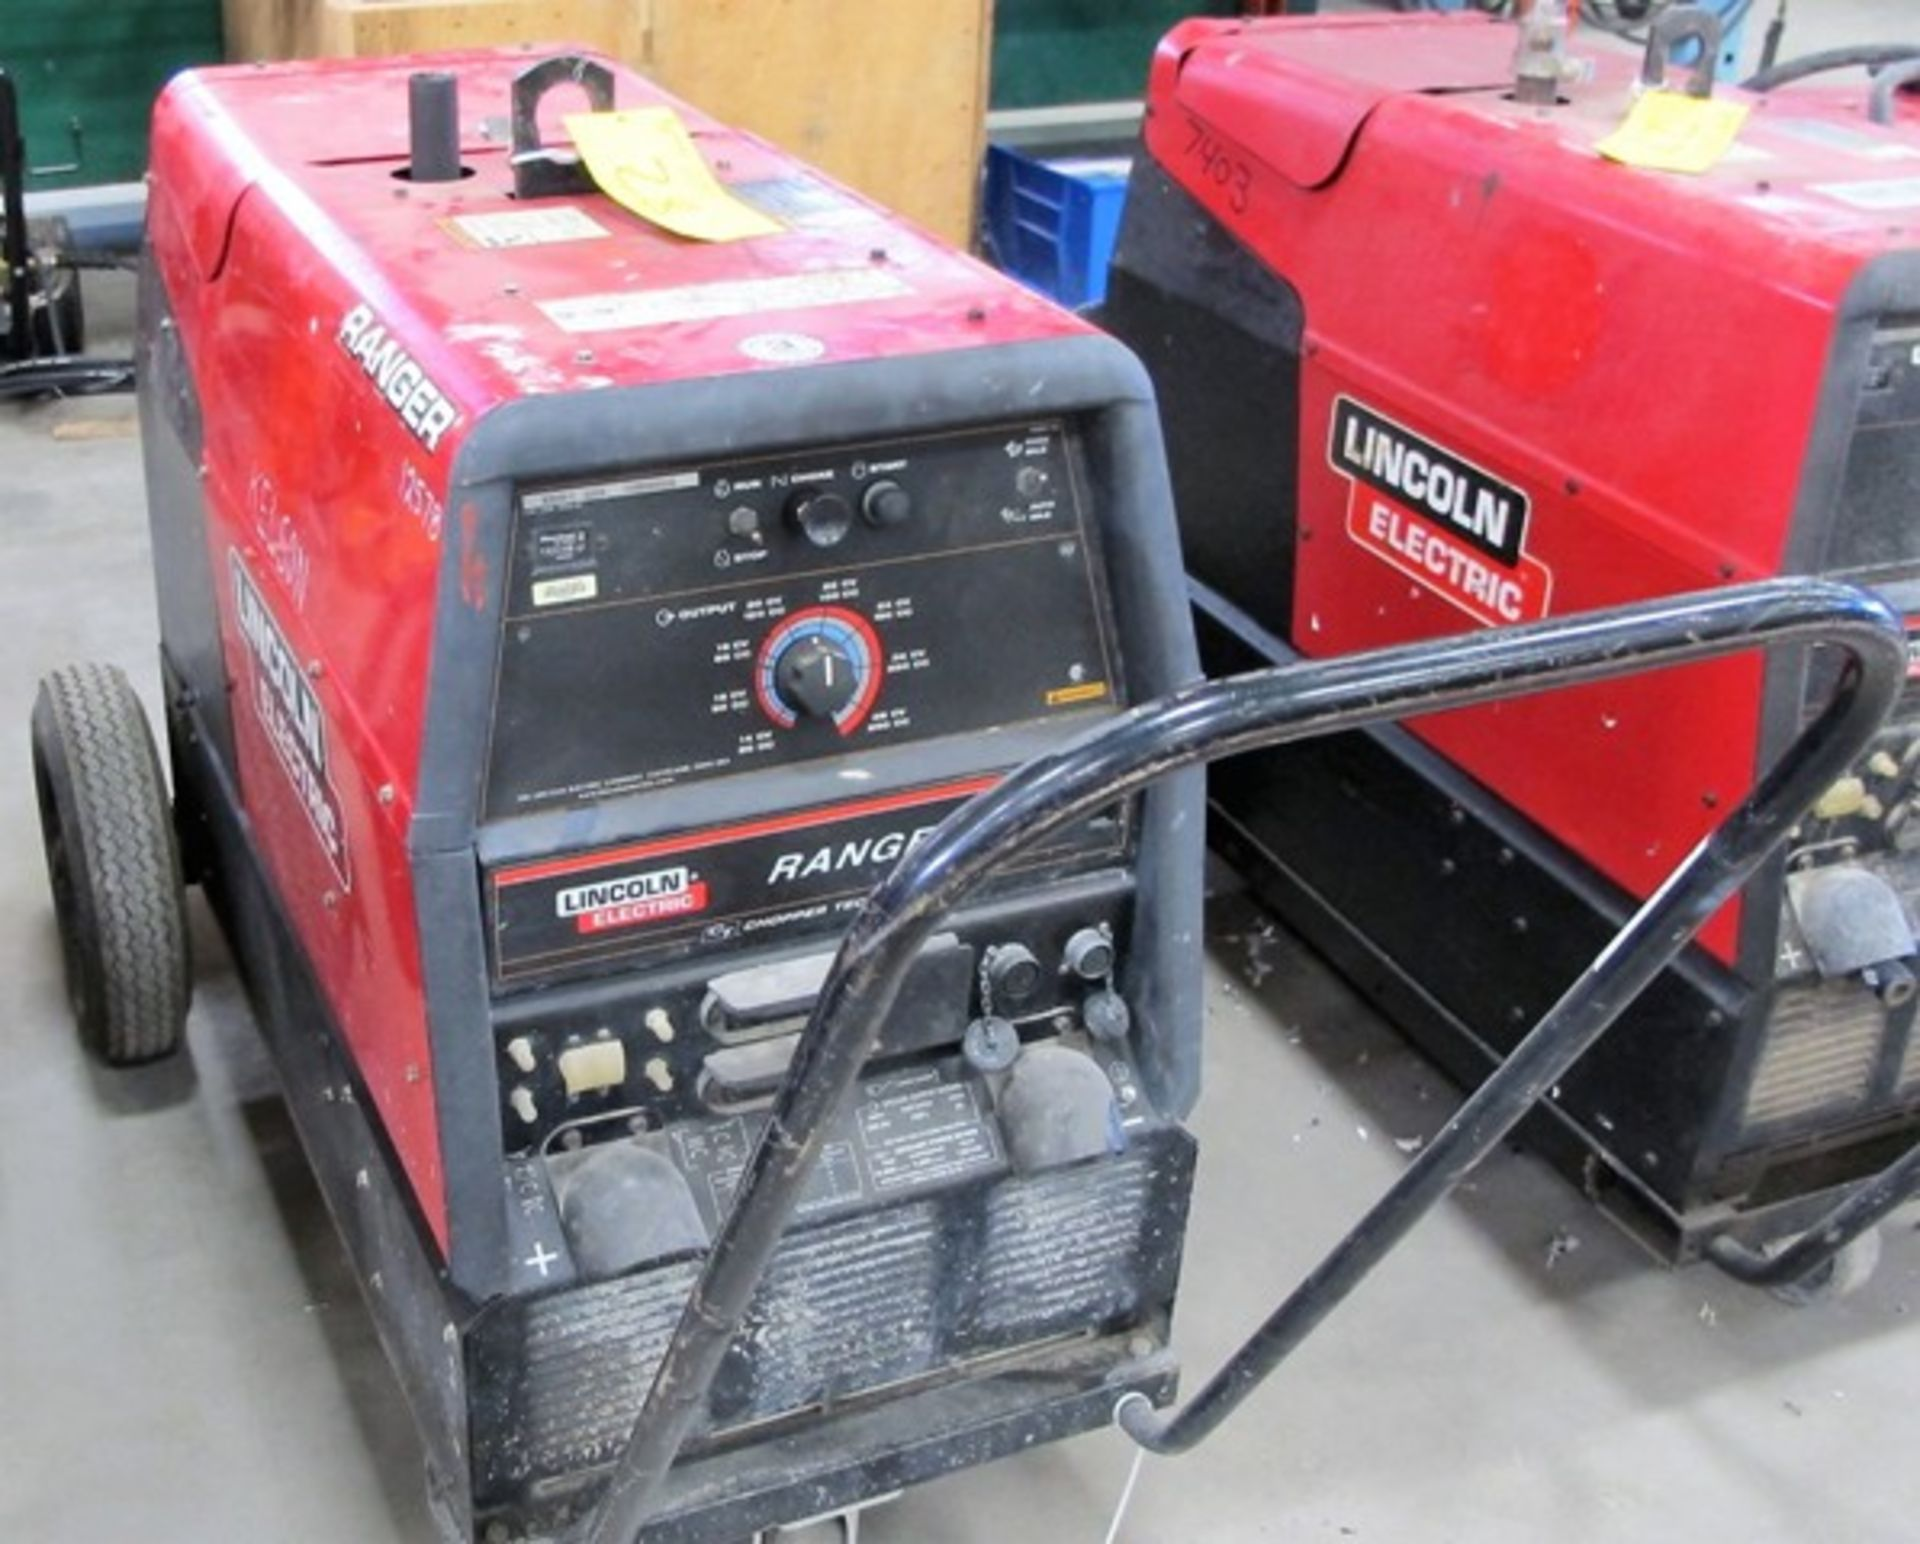 LINCOLN ELECTRIC, MOD 305L9, RANGER ARC WELDER, S/N U1110810992